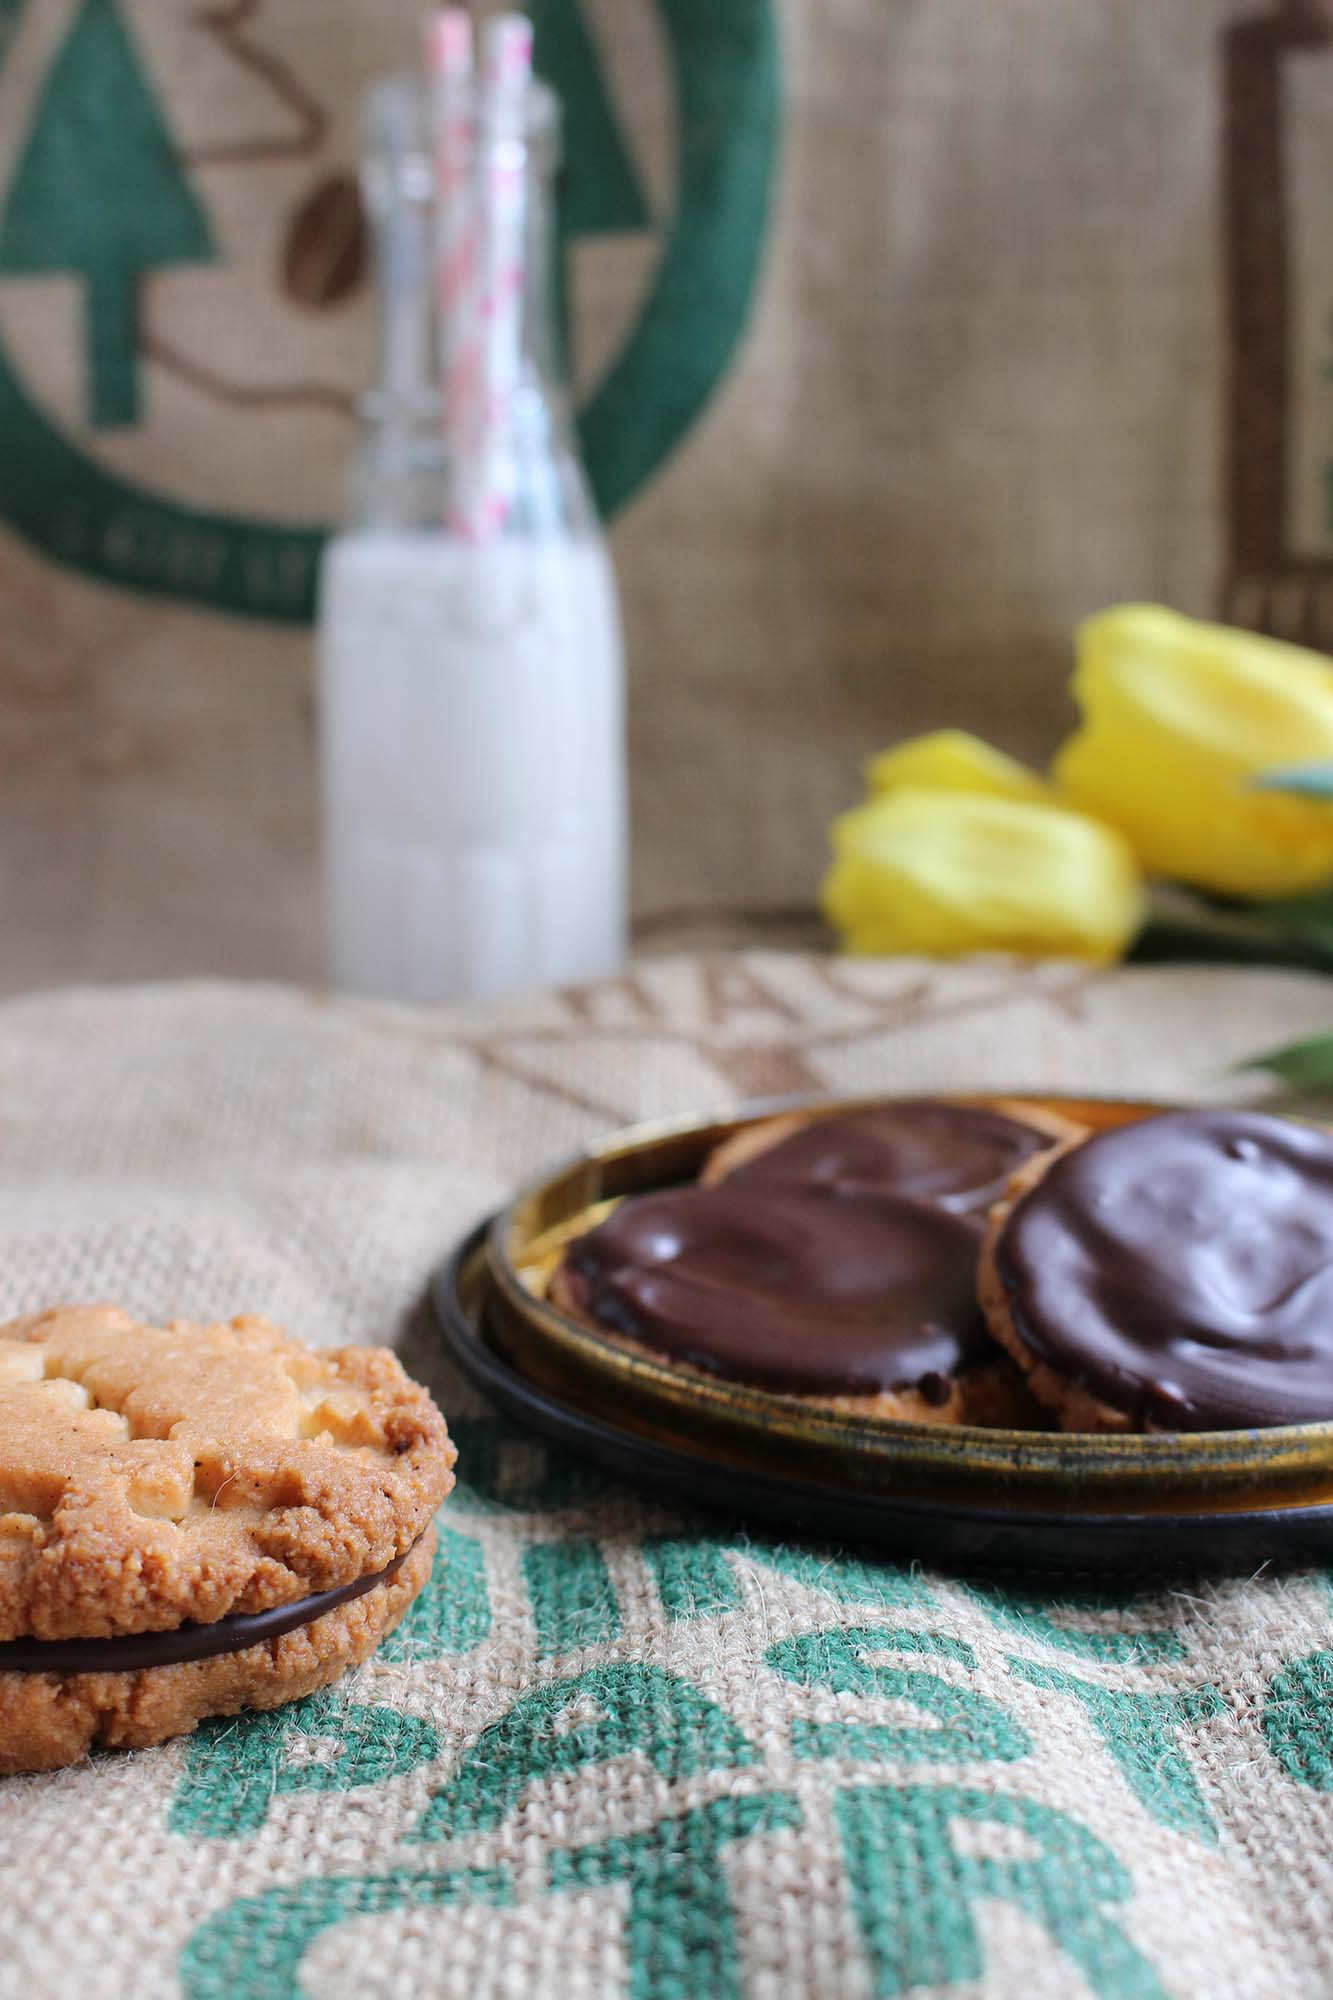 Hjemmelavede chokoladekiks